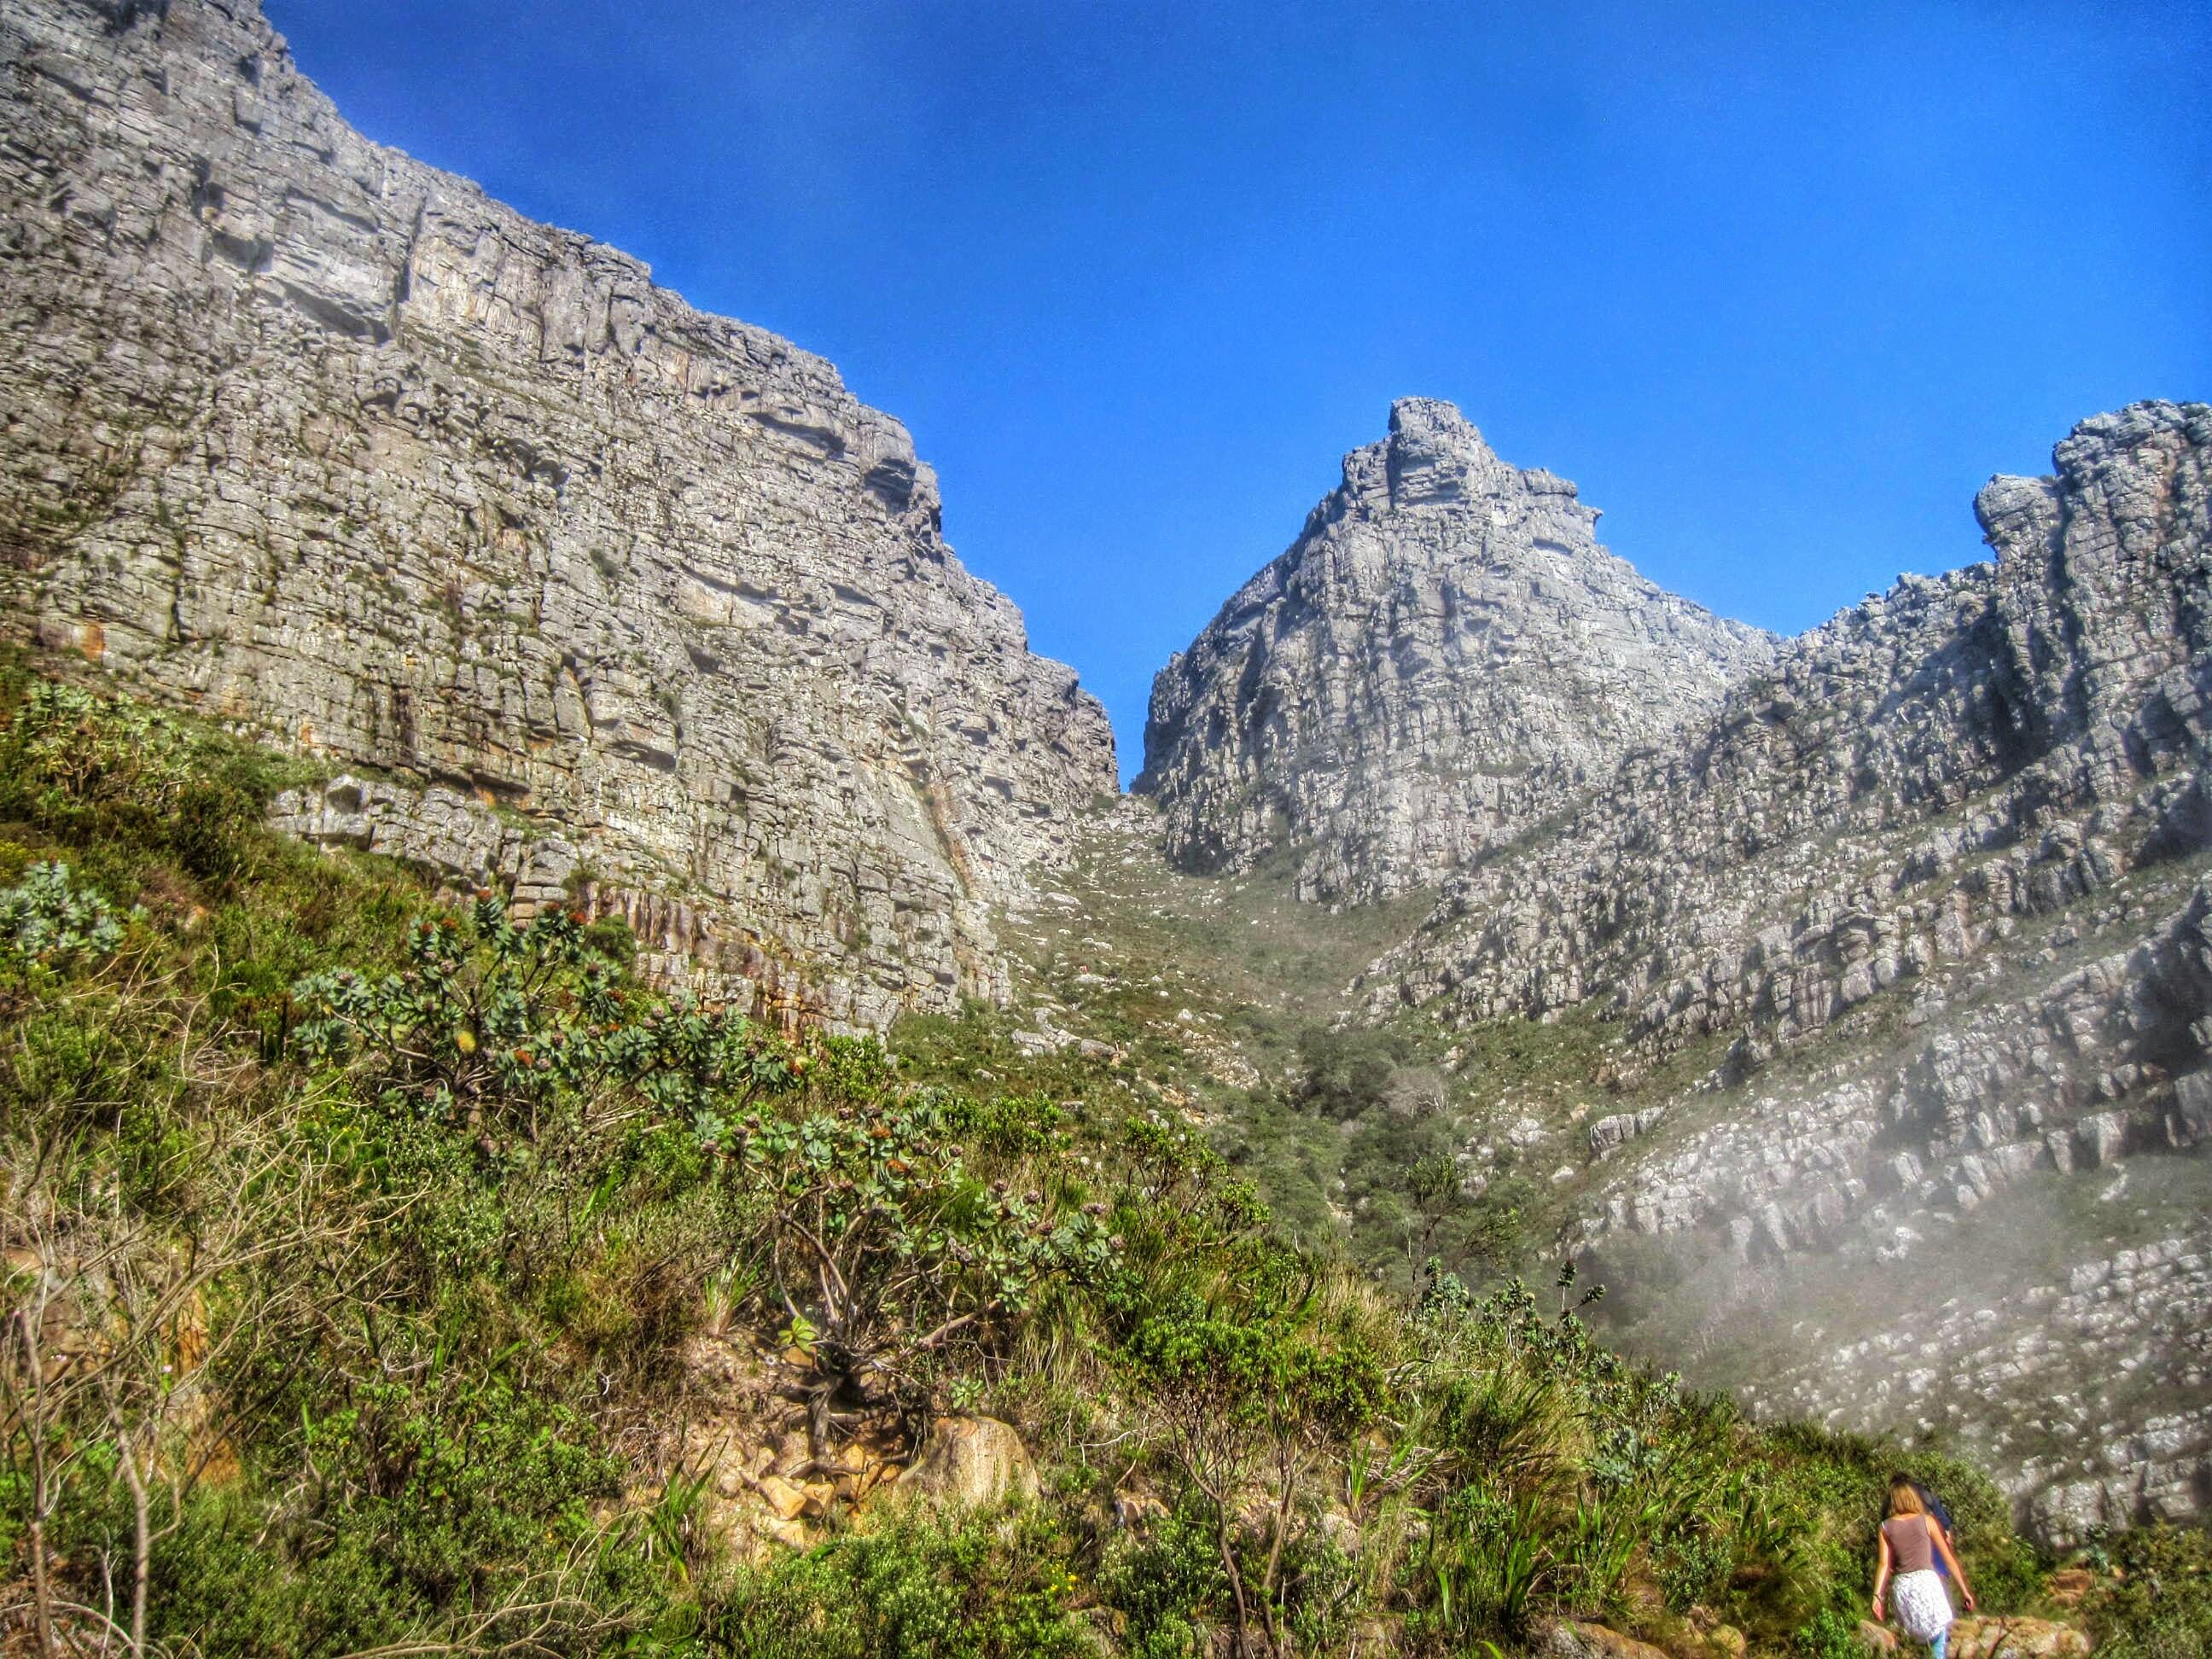 Album Google Plasttekpp Photo Hiking Table Mountain Up Platteklip Gorge